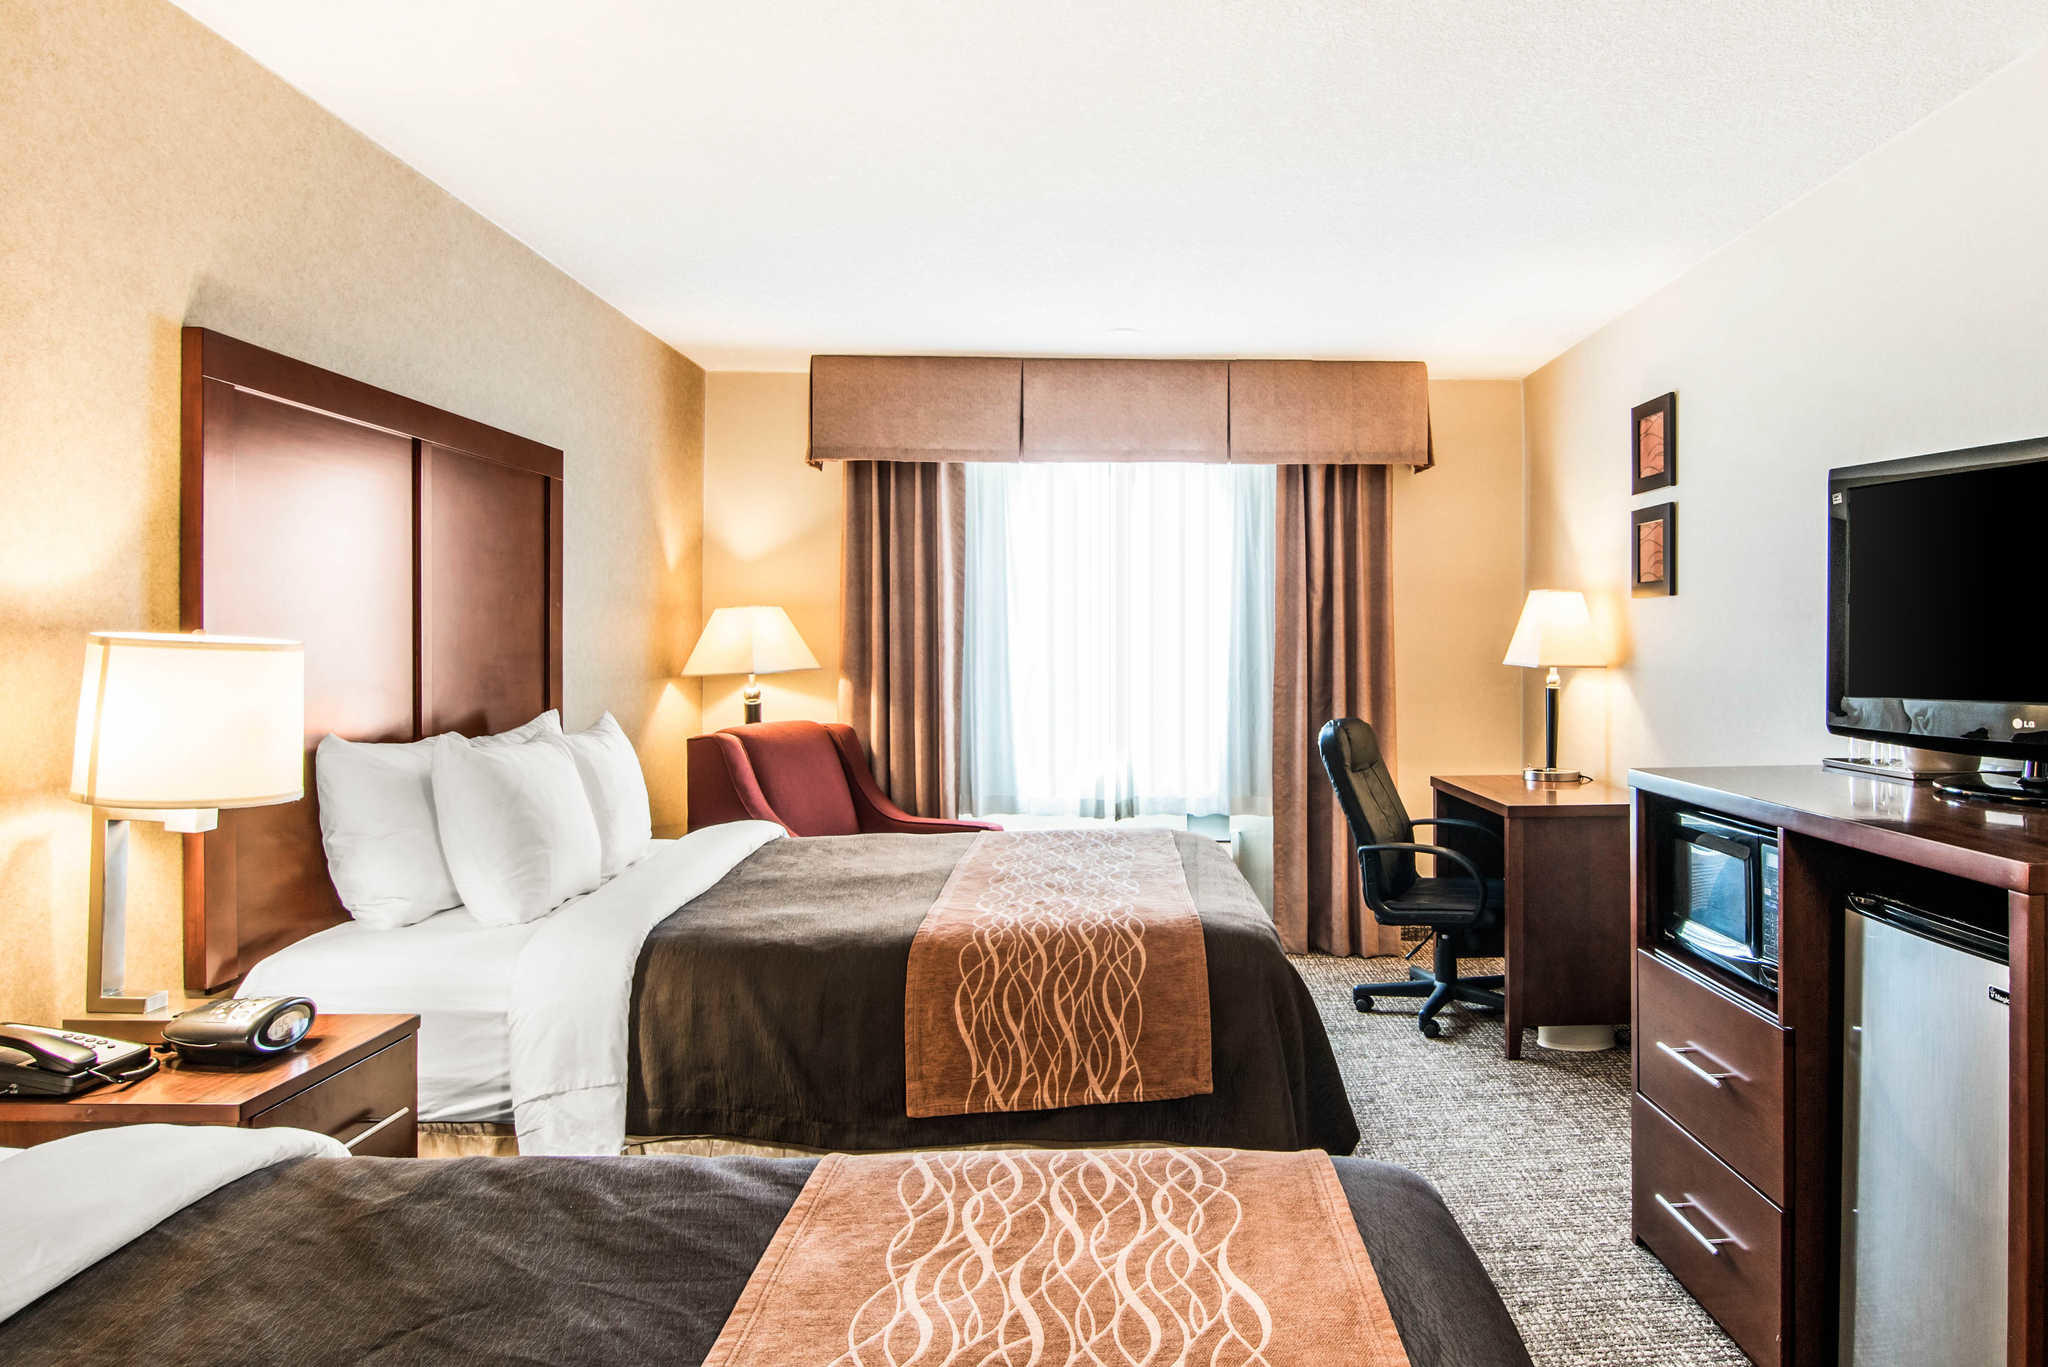 Comfort Inn & Suites image 18